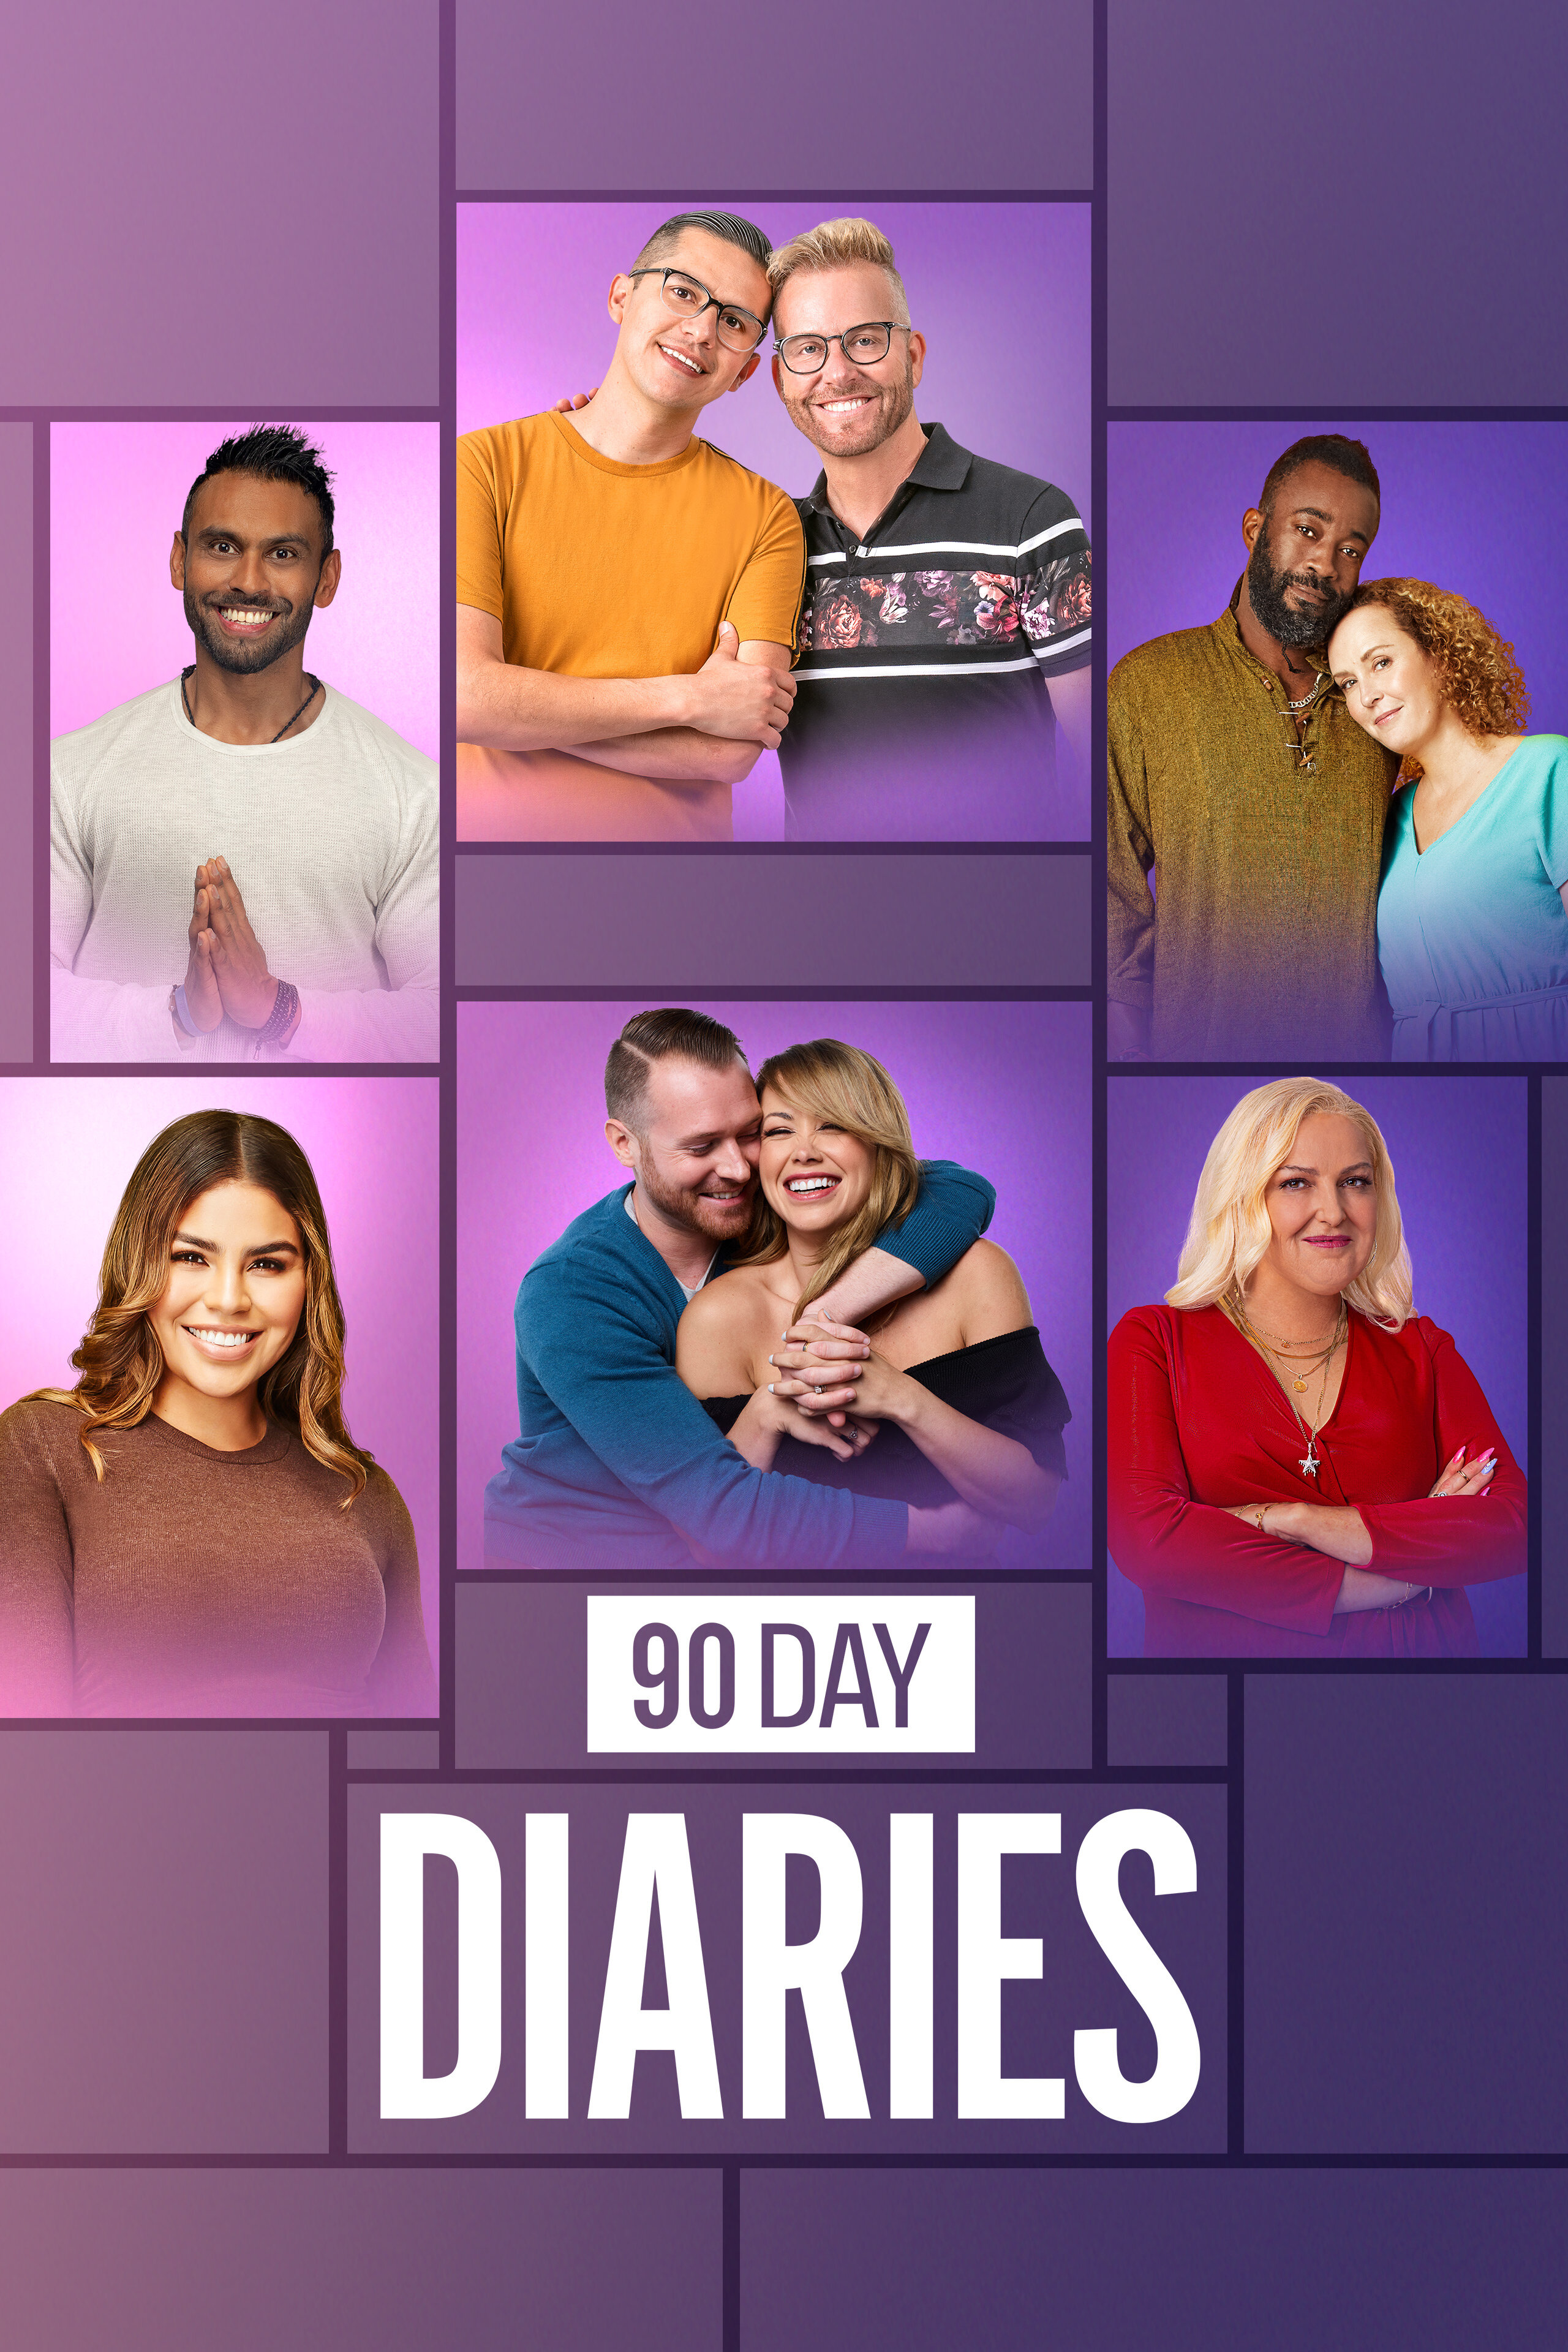 90 Day Diaries ne zaman